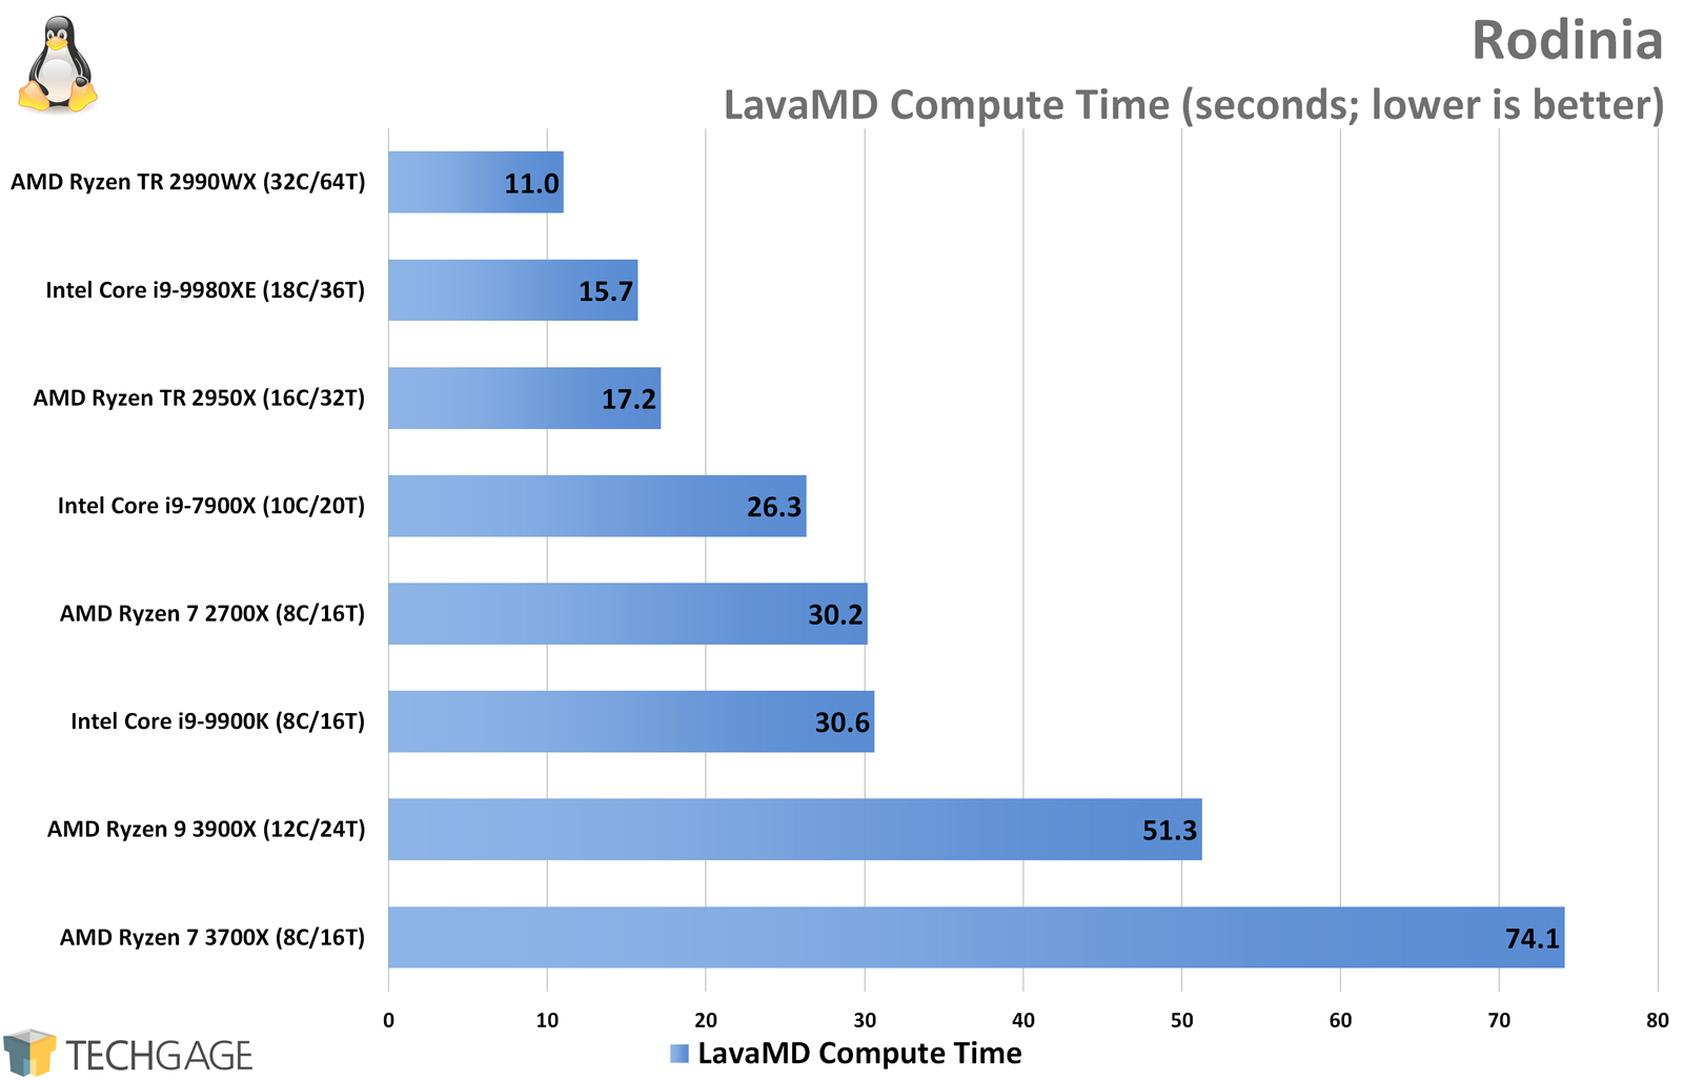 Rodinia Performance (LavaMD, AMD Ryzen 9 3900X and 7 3700X)